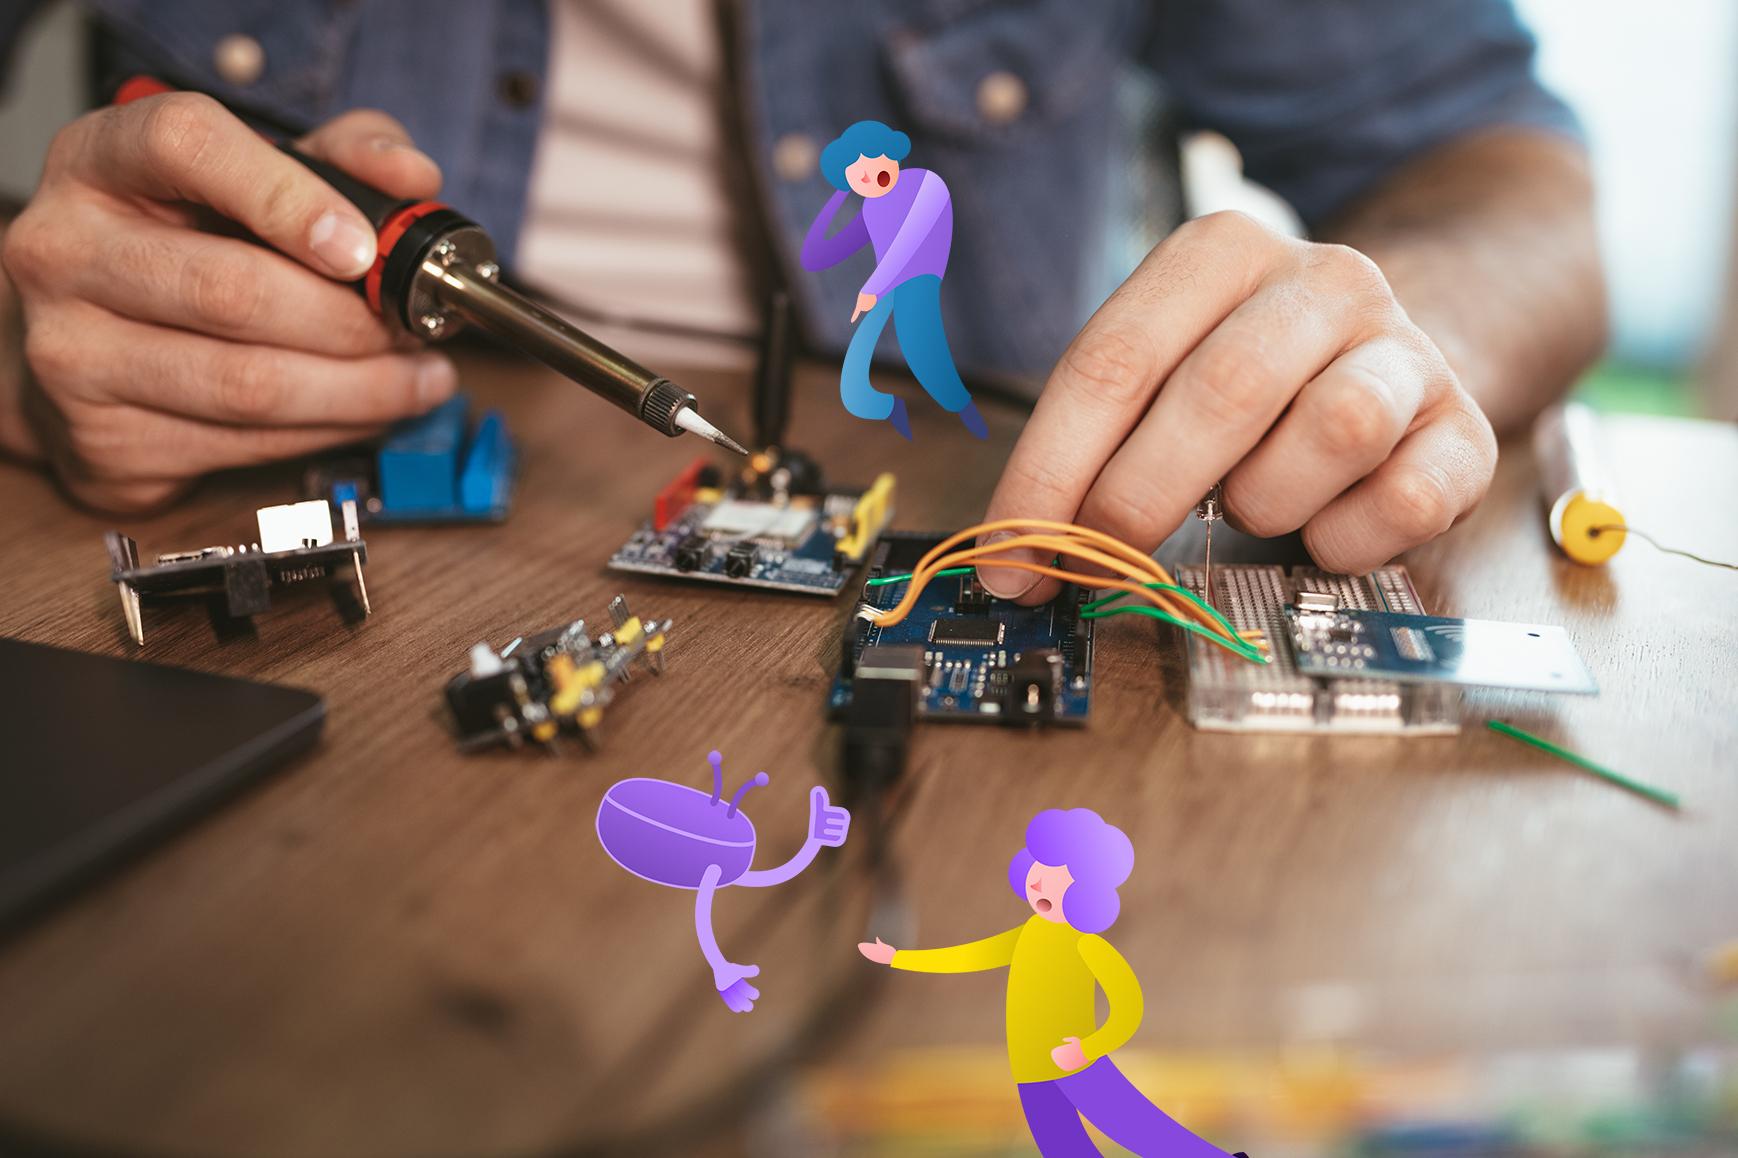 soldering-electronic-circuit-board-52QJNSA